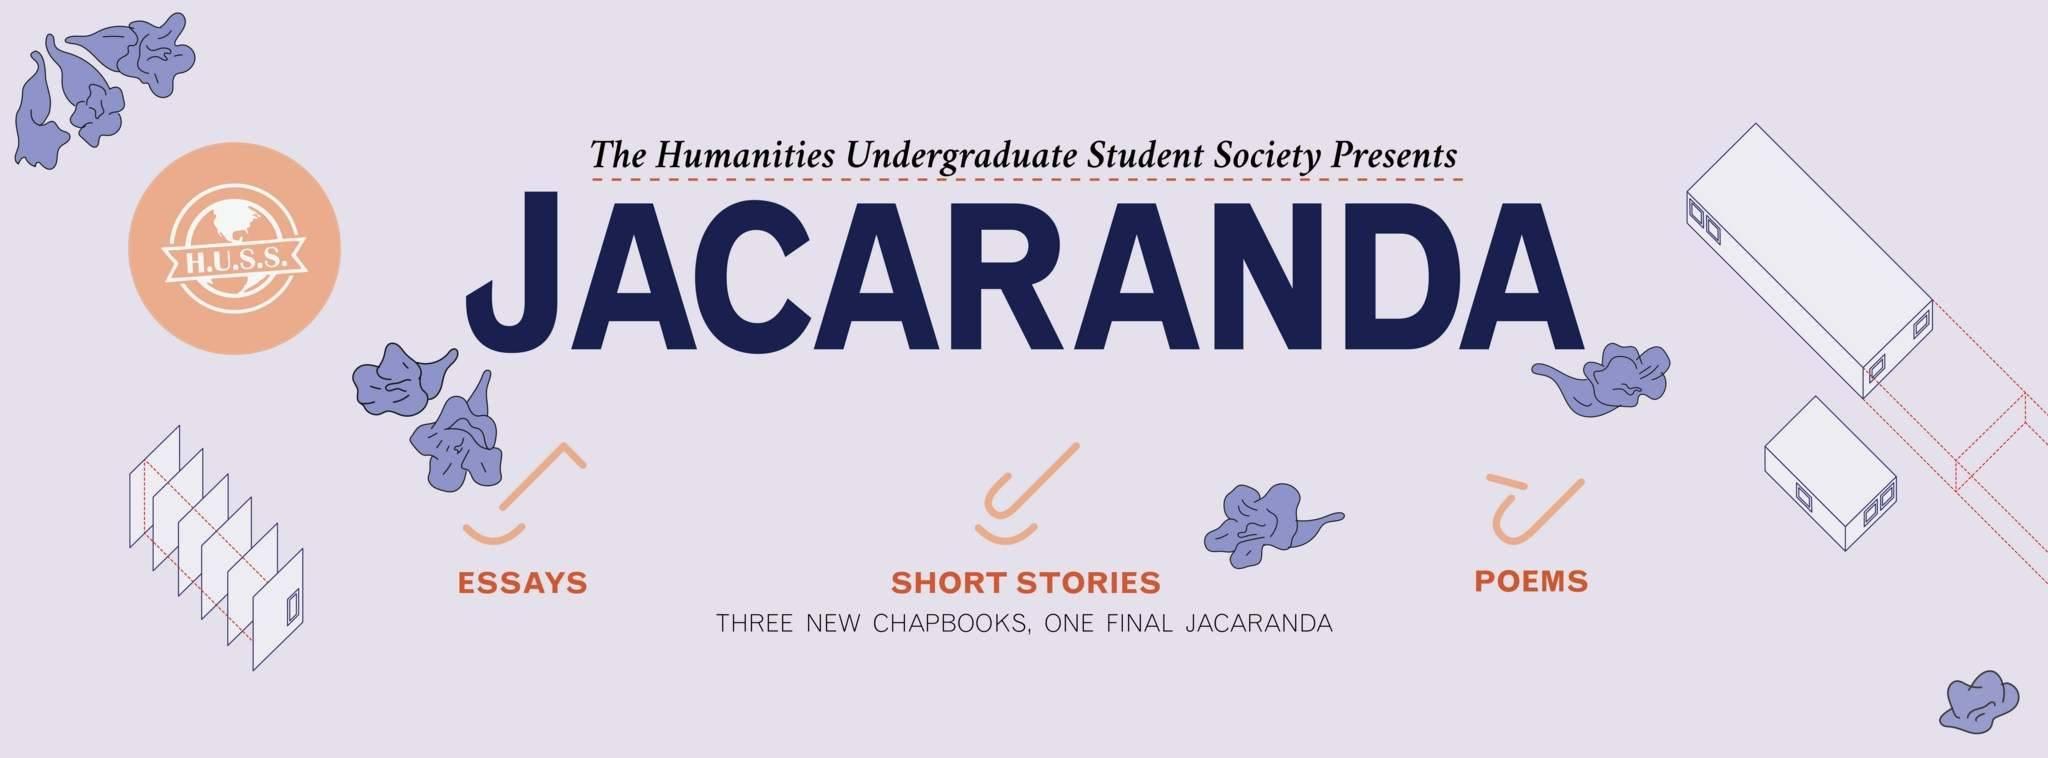 Jacaranda Cover.jpg